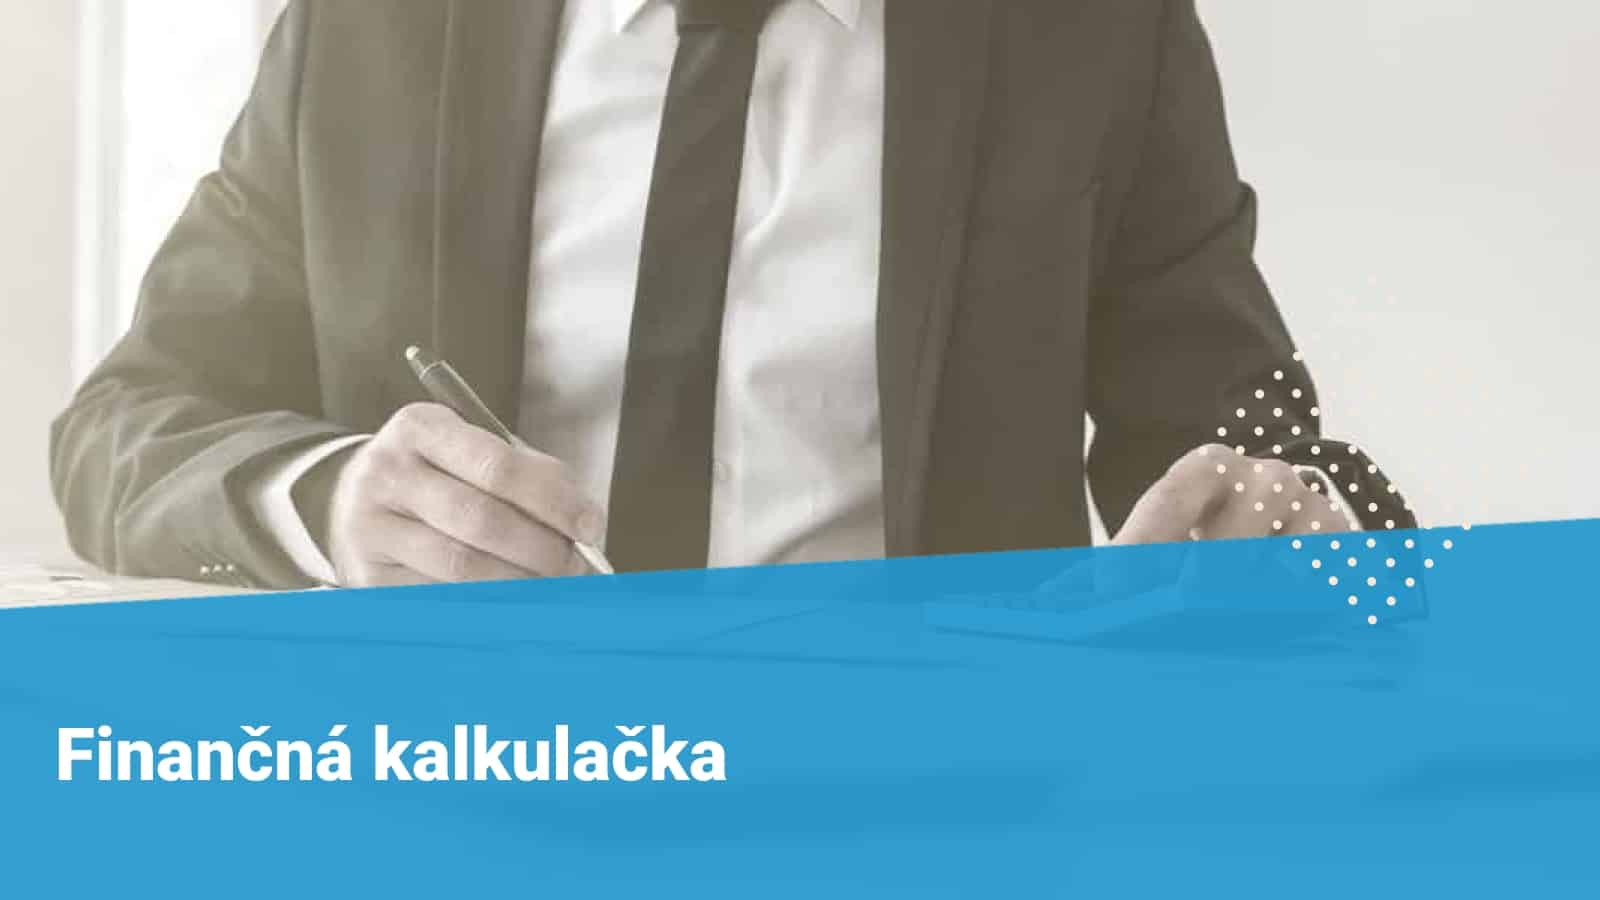 financna_kalkulacka-financer